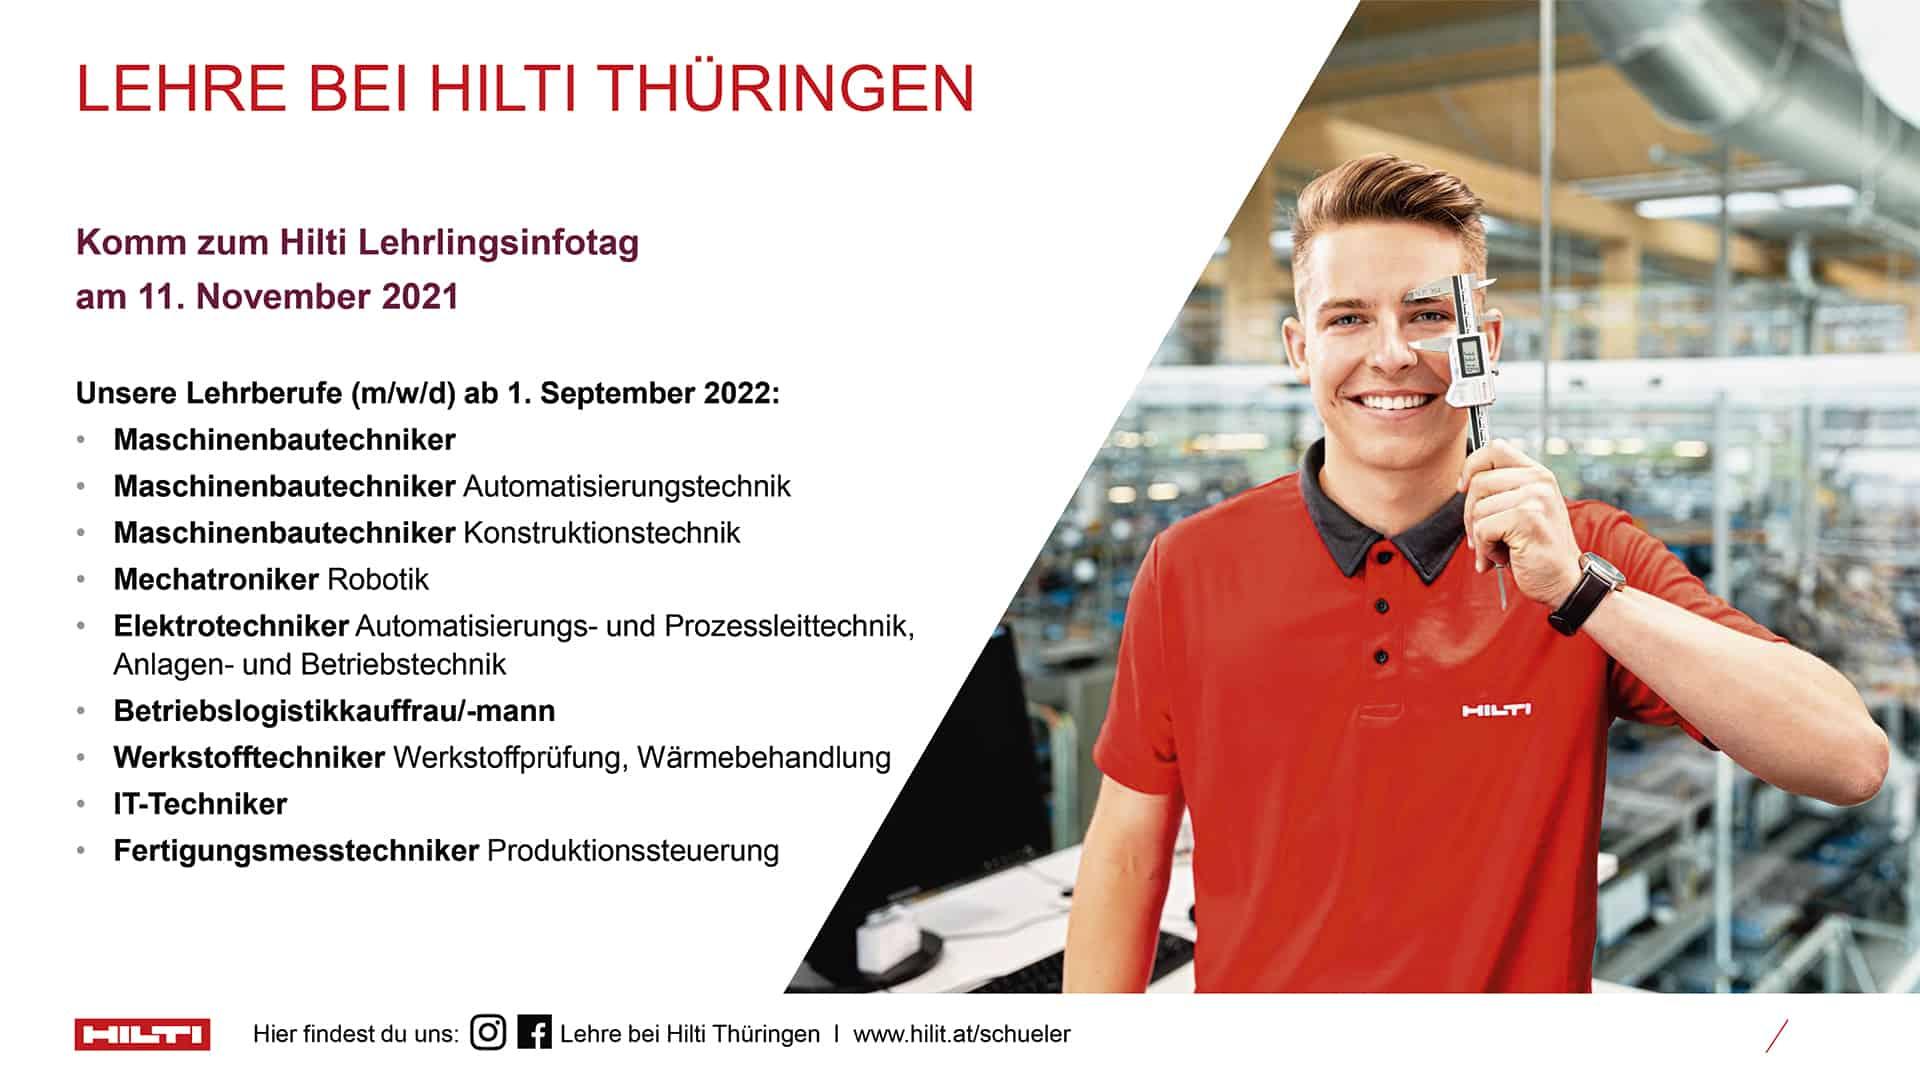 lehre24.at - Lehre bei Hilti Thüringen - Lehrlingsinfotag 11-2021